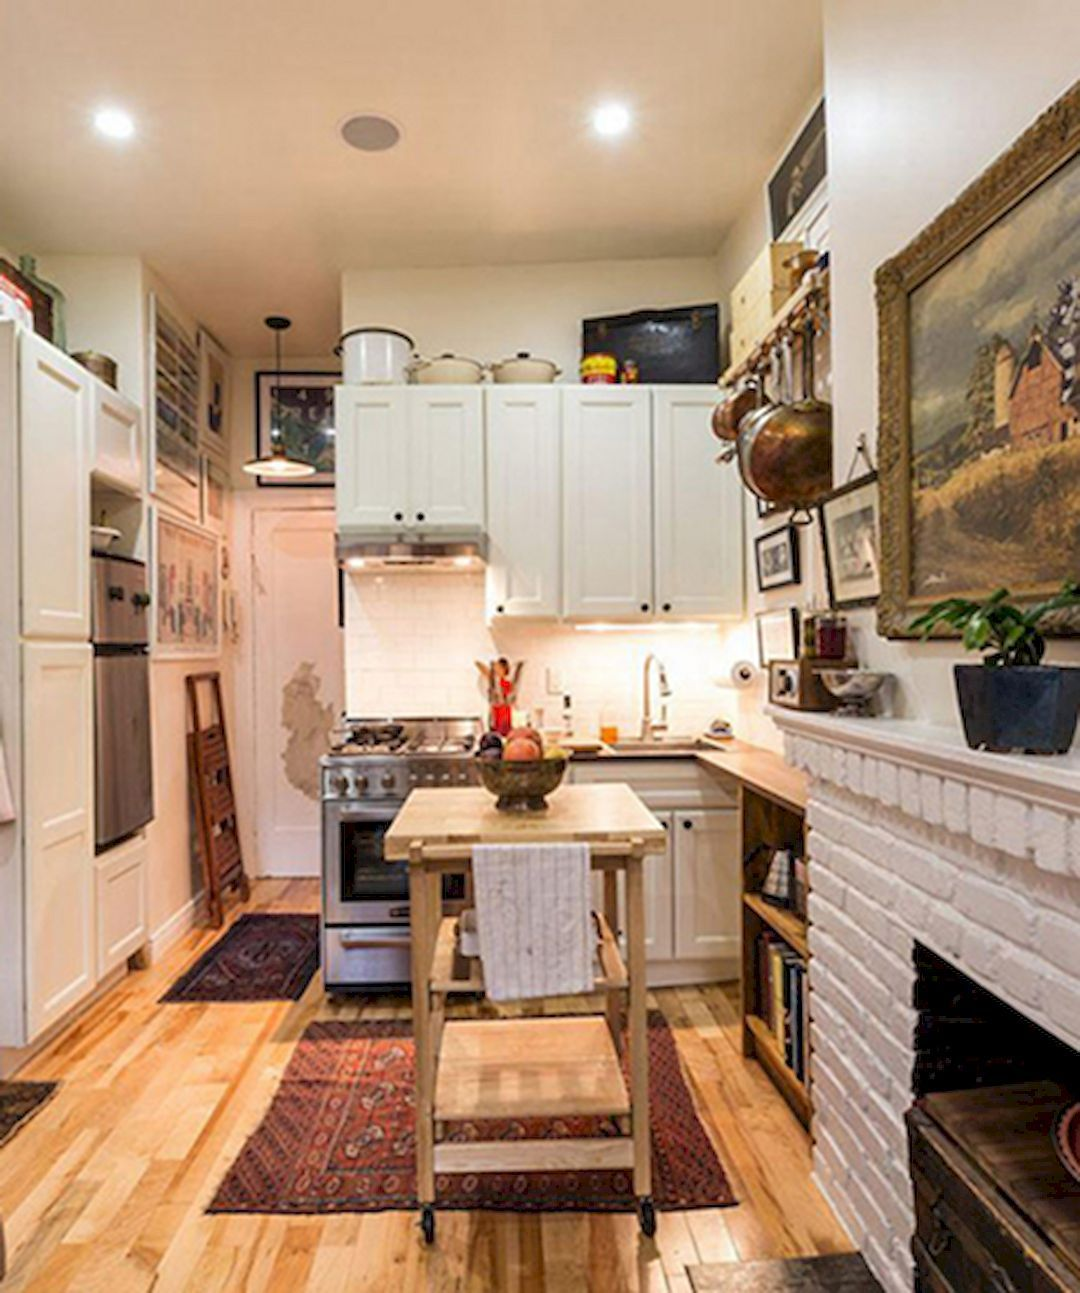 Apartments Kitchen Ideas Html on bedroom ideas, dining room ideas, apartment therapy kitchens, apartment kitchens before and after, apartment sized kitchens, apartment design,